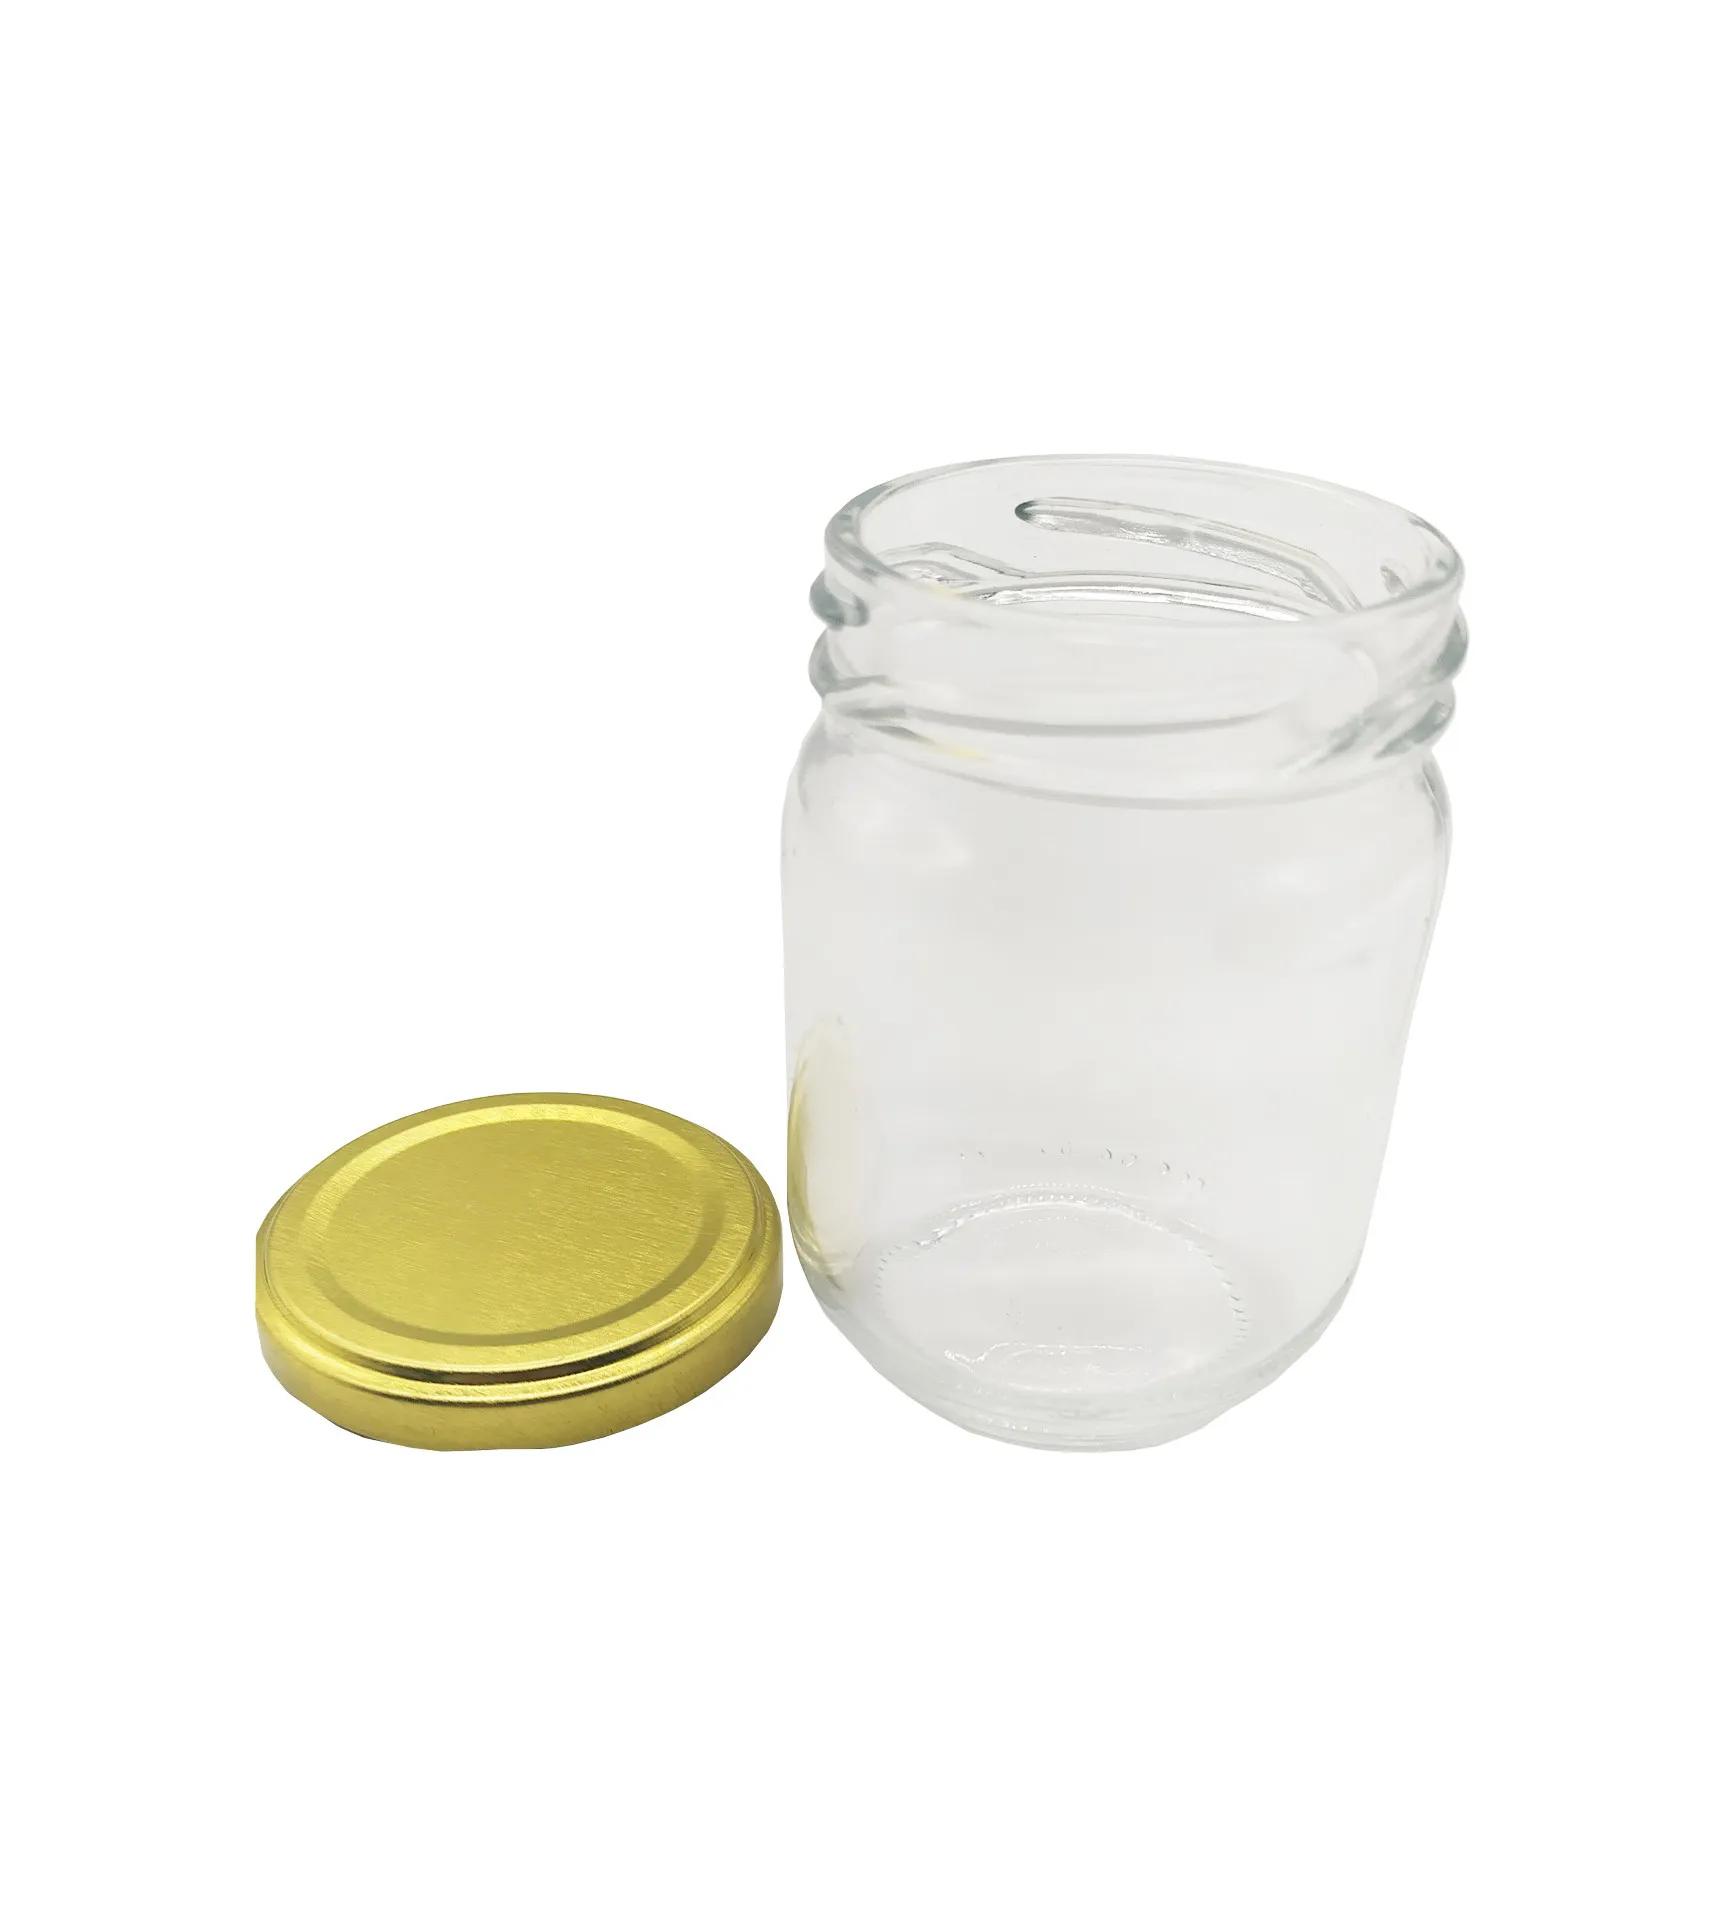 Pote vidro 200ml cx com 24 unidades